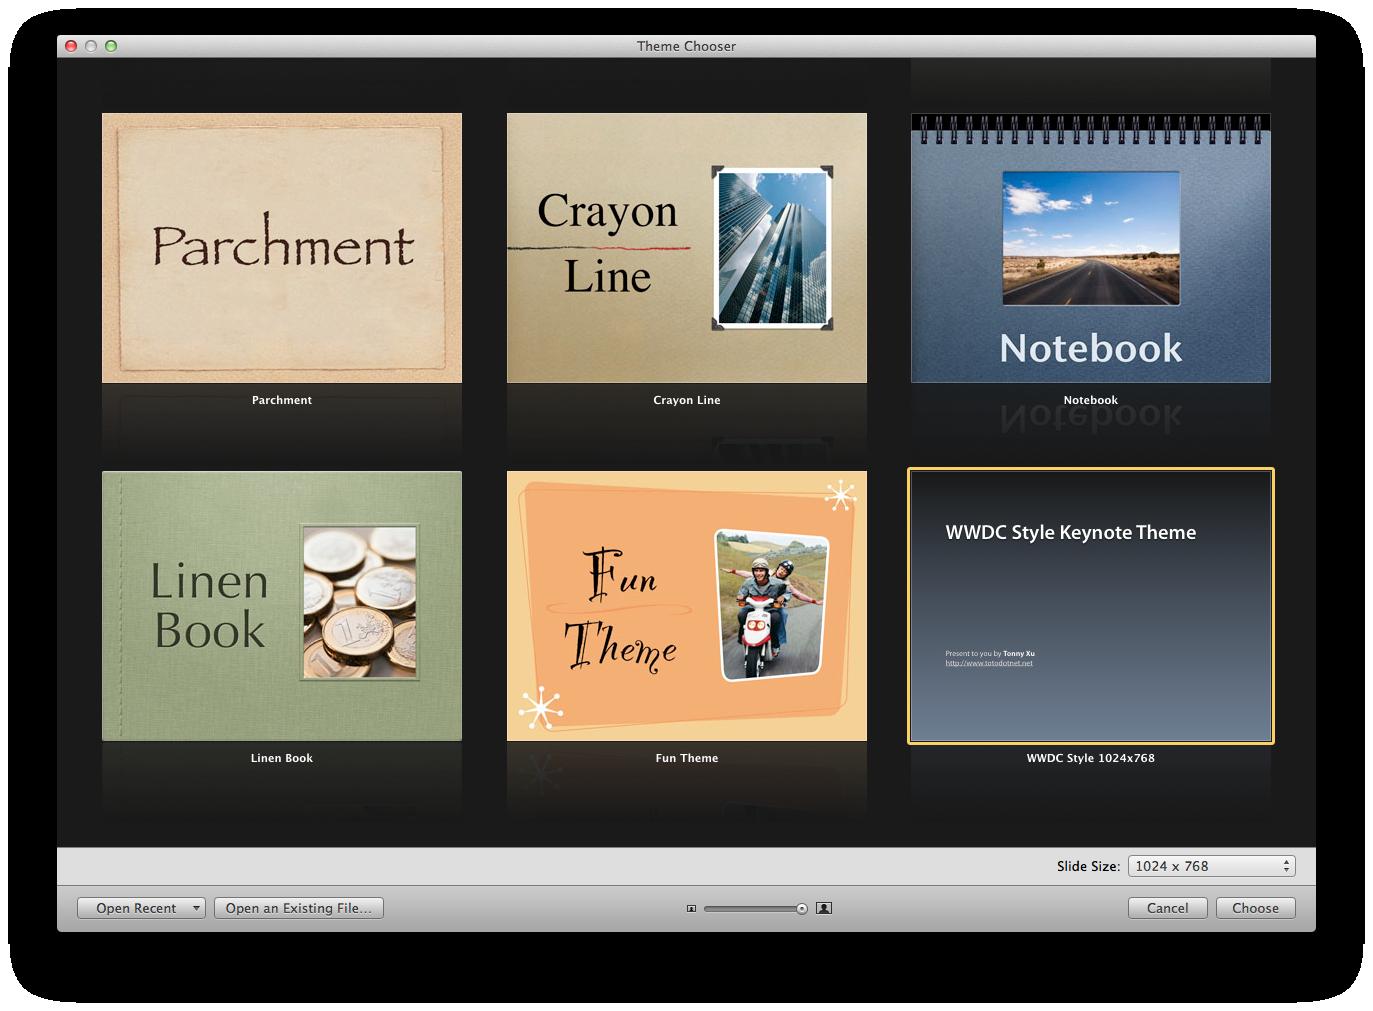 tonny xu: wwdc-style keynote themes | free keynote templates, Powerpoint templates